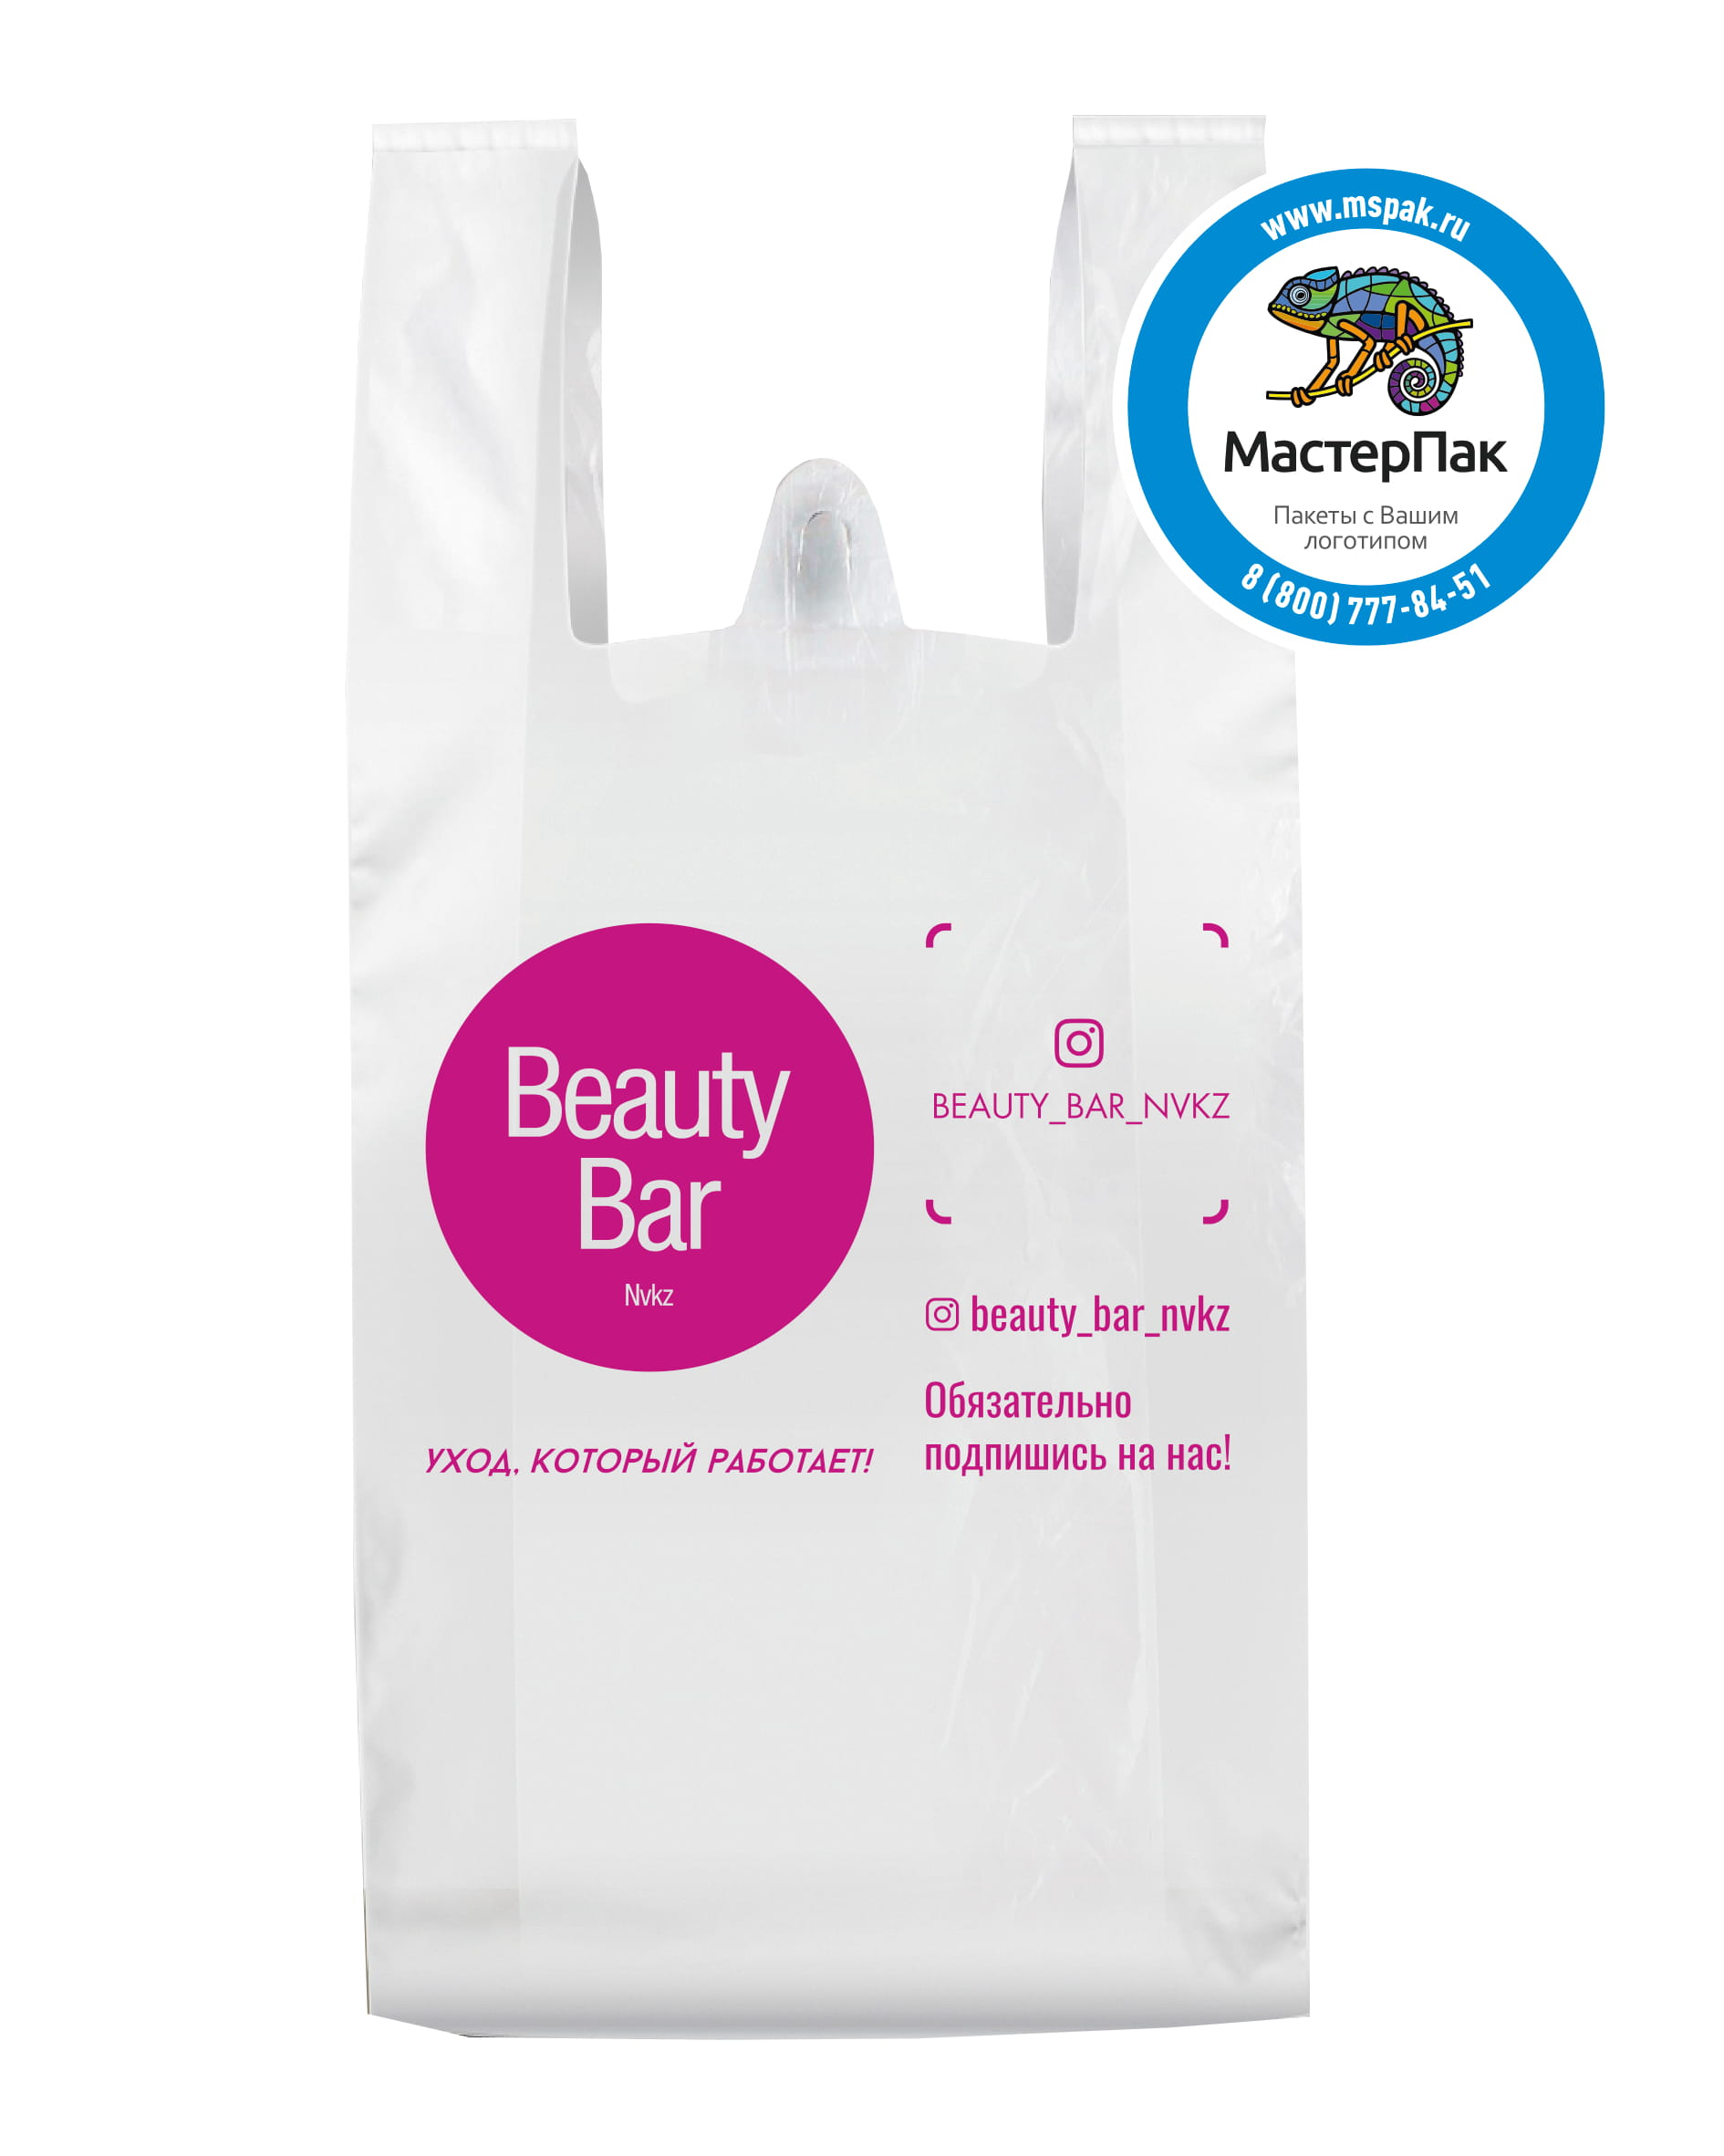 Пакет-майка ПНД с логотипом салона красоты Beauty Bar, Грозный, 22 мкм, 40*60